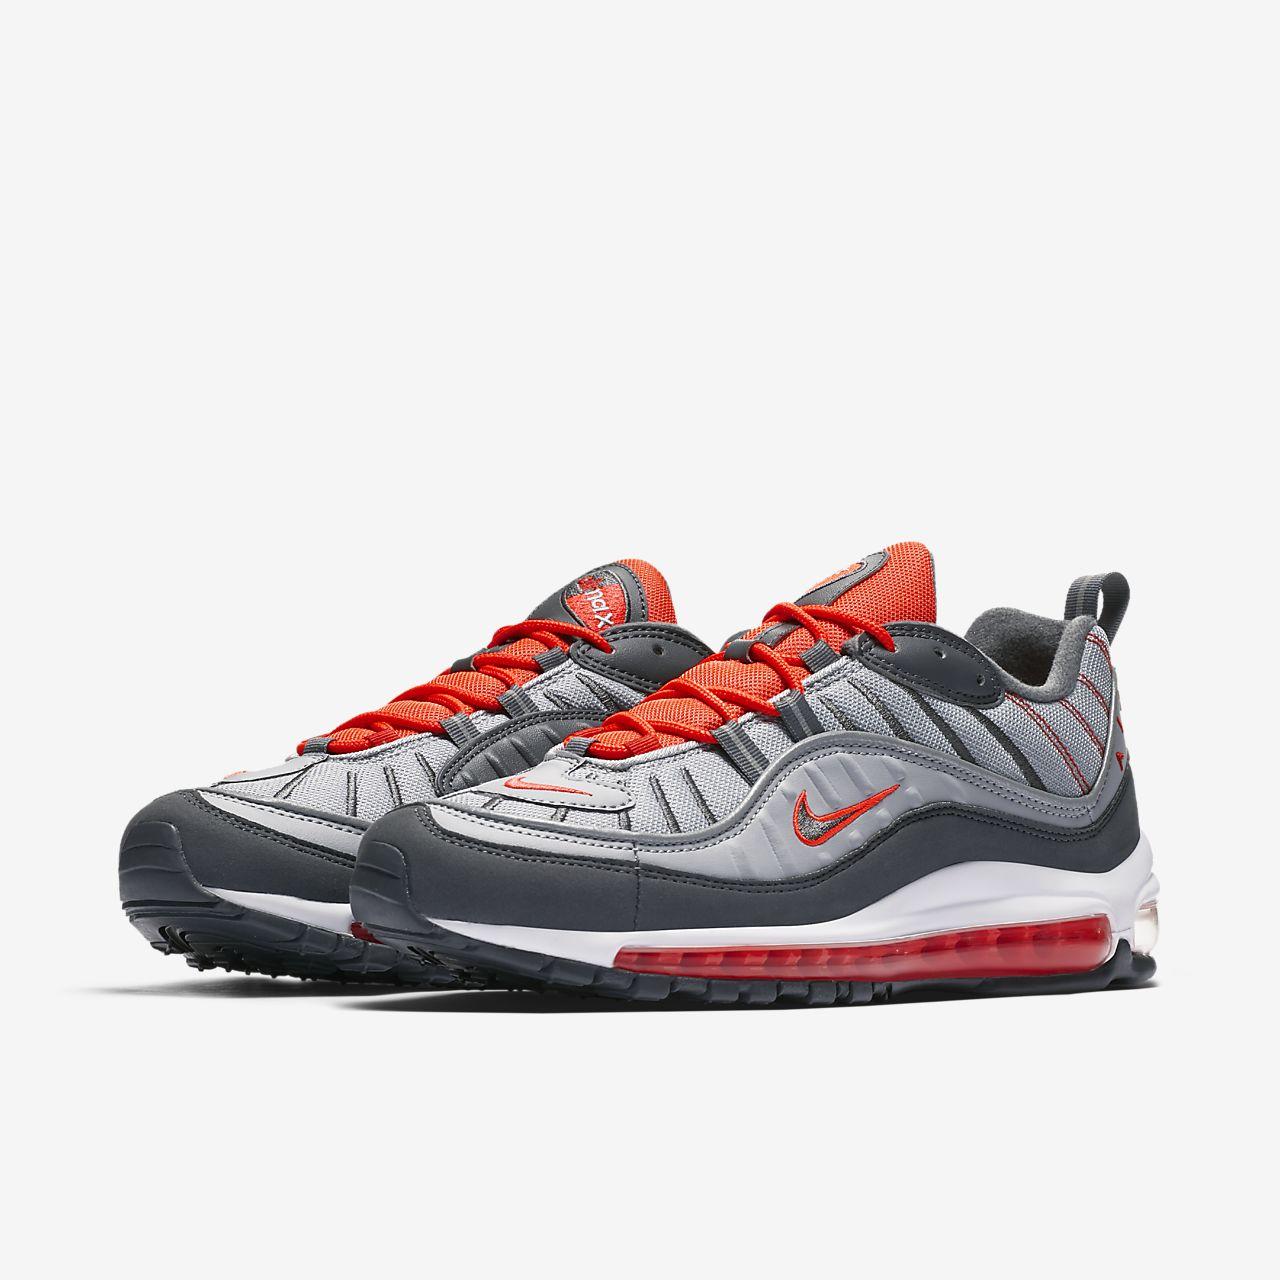 Nike Zapatillas de Material Sintético Para Hombre Gris Gris, Color Gris, Talla 42